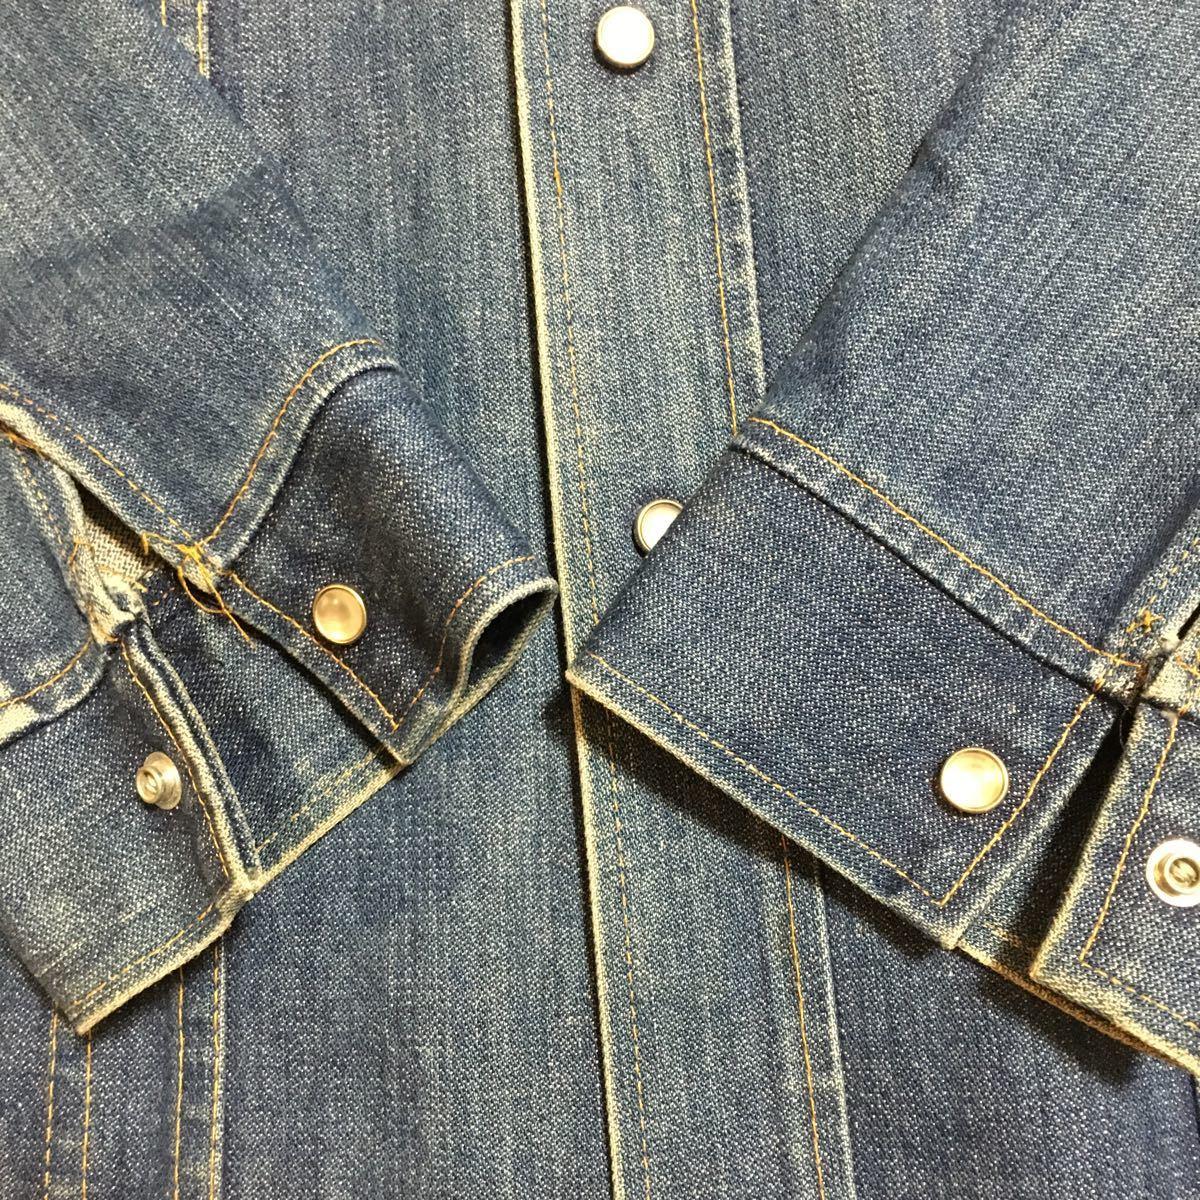 70s USA製 SEDGEFIELD DO-NOTHING デニムジャケット ウエスタンシャツ Sサイズ 古着 ヴィンテージ _画像5